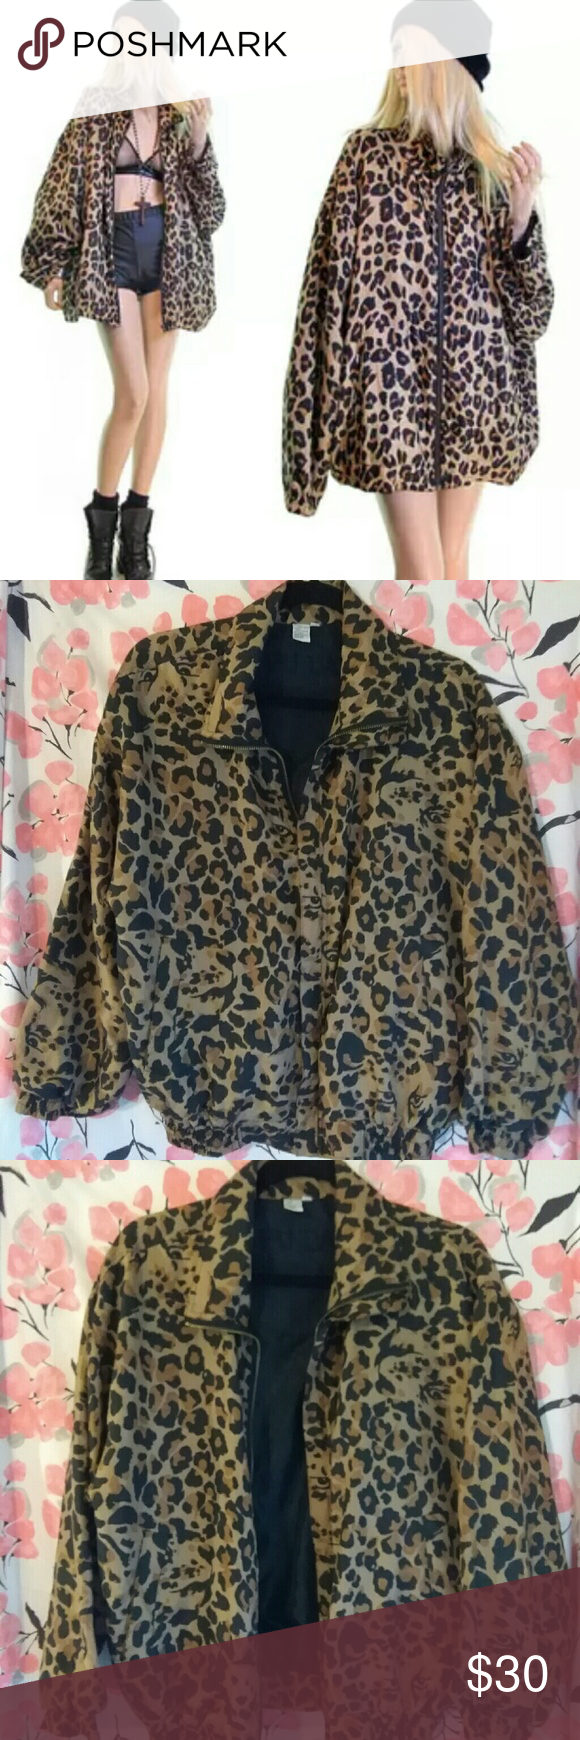 051ba2cfc Vintage FUDA Leopard Print Silk Bomber Jacket Vintage FUDA ...